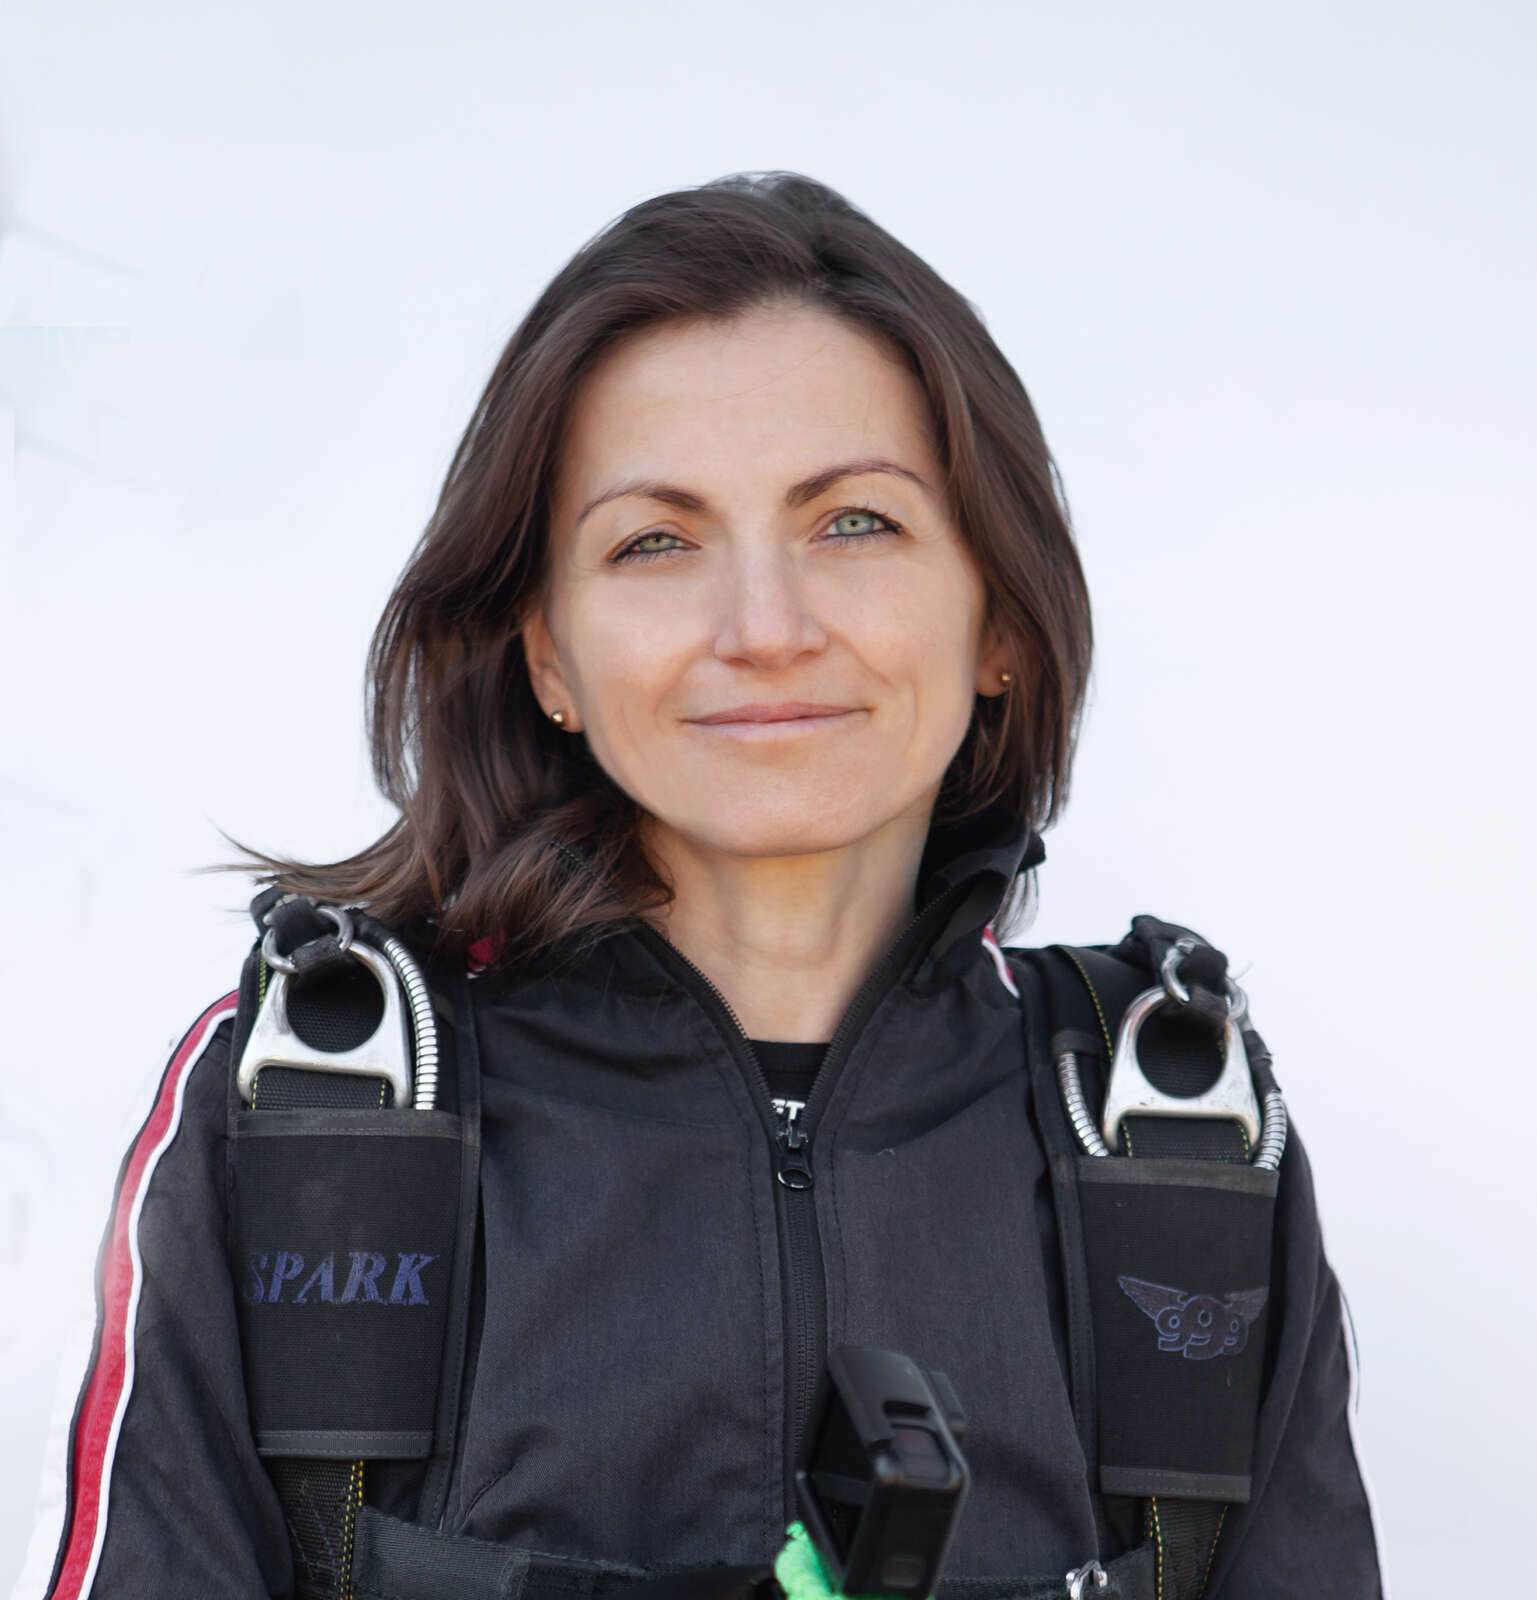 Marina Mchedleshvili